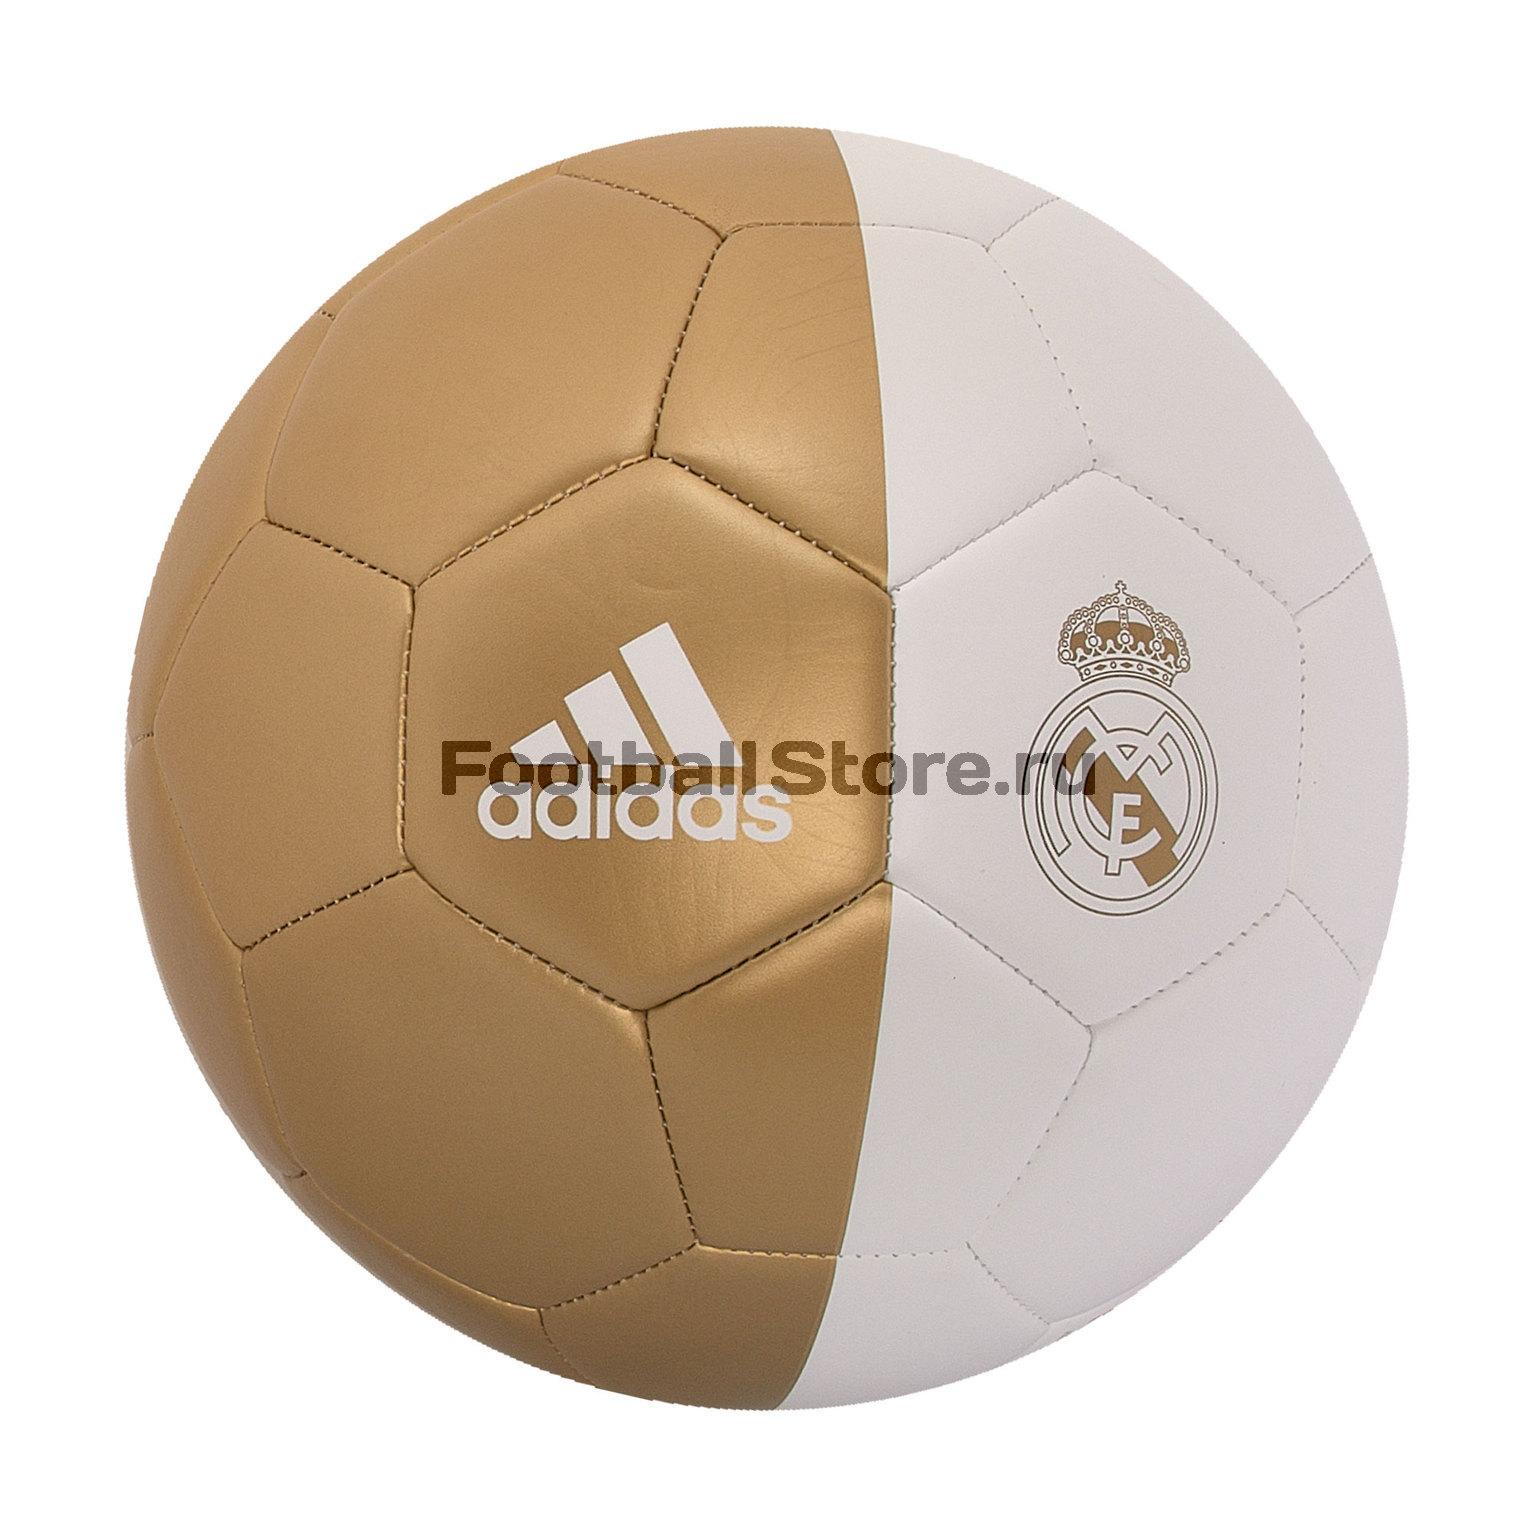 Футбольный мяч Adidas Real Madrid DY2524 мяч футбольный adidas real madrid fbl cw4156 белый серый размер 3